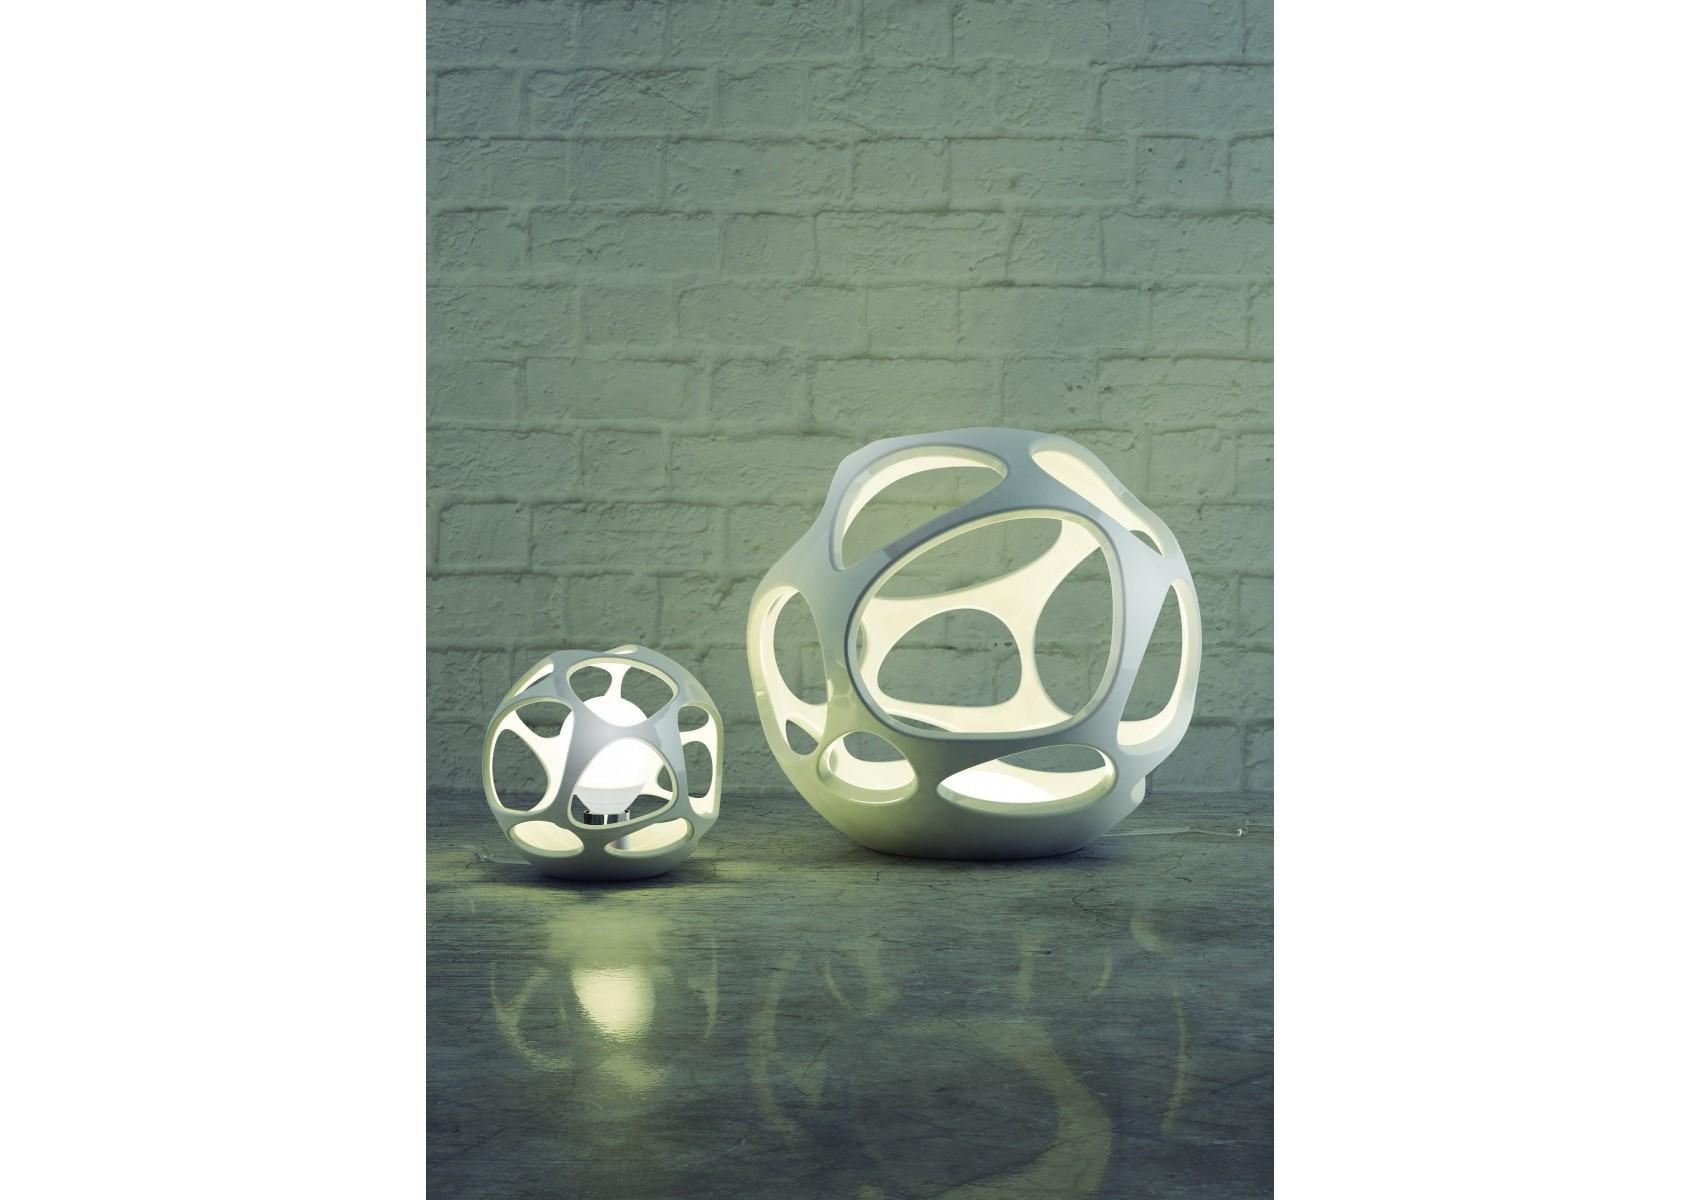 Lampe de table design Organica - Boite à design